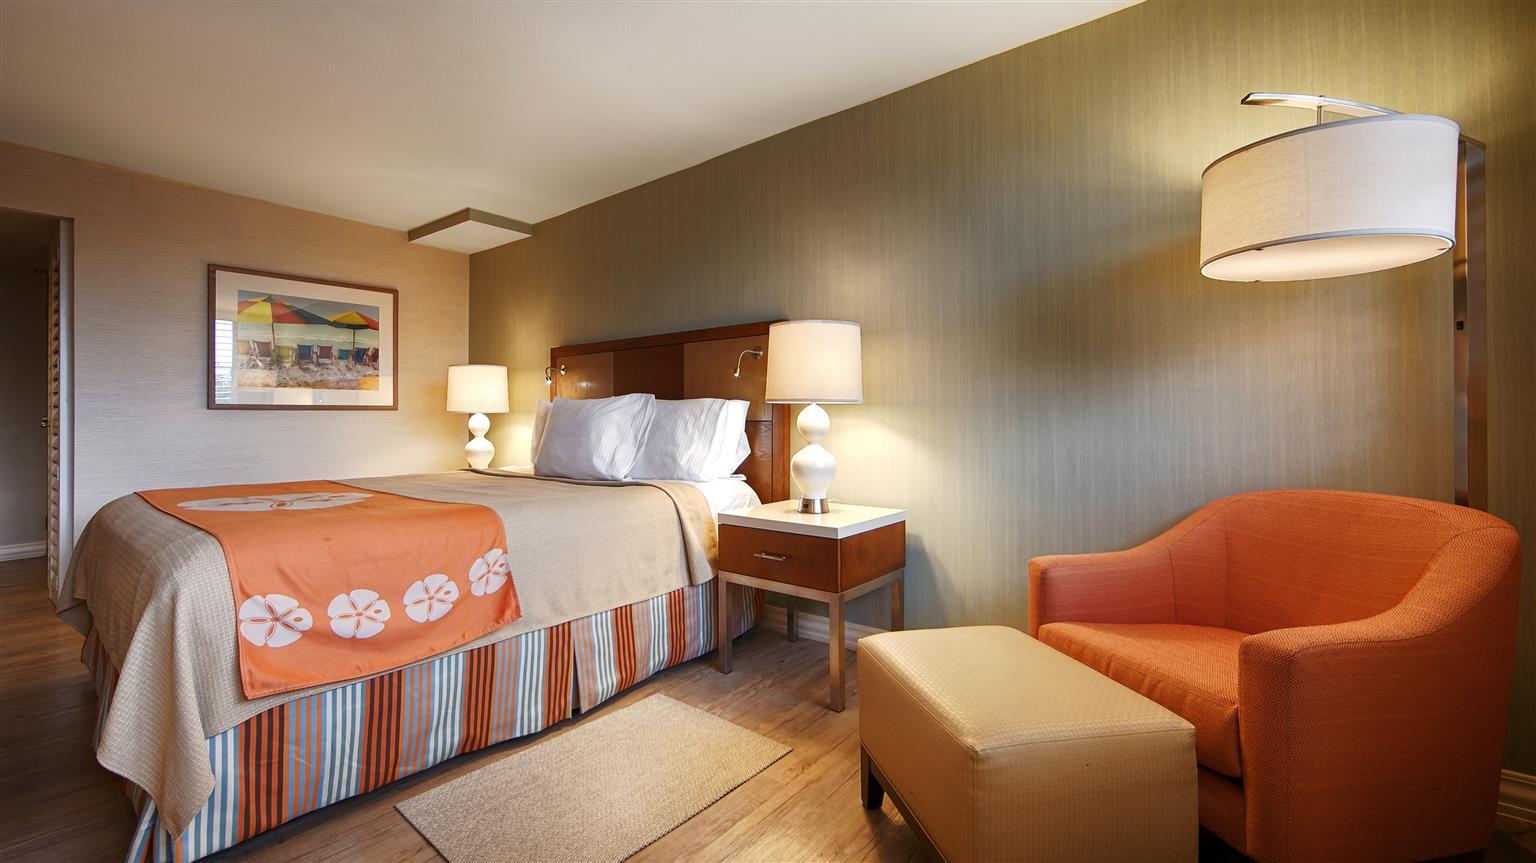 Hudson hotel new york nyc 2013 003 - 05509_000_exterior 05509_001_exterior 05509_002_exterior 05509_003_guestroom 05509_004_guestroom 05509_005_guestroom 05509_006_guestroom 05509_007_guestroom